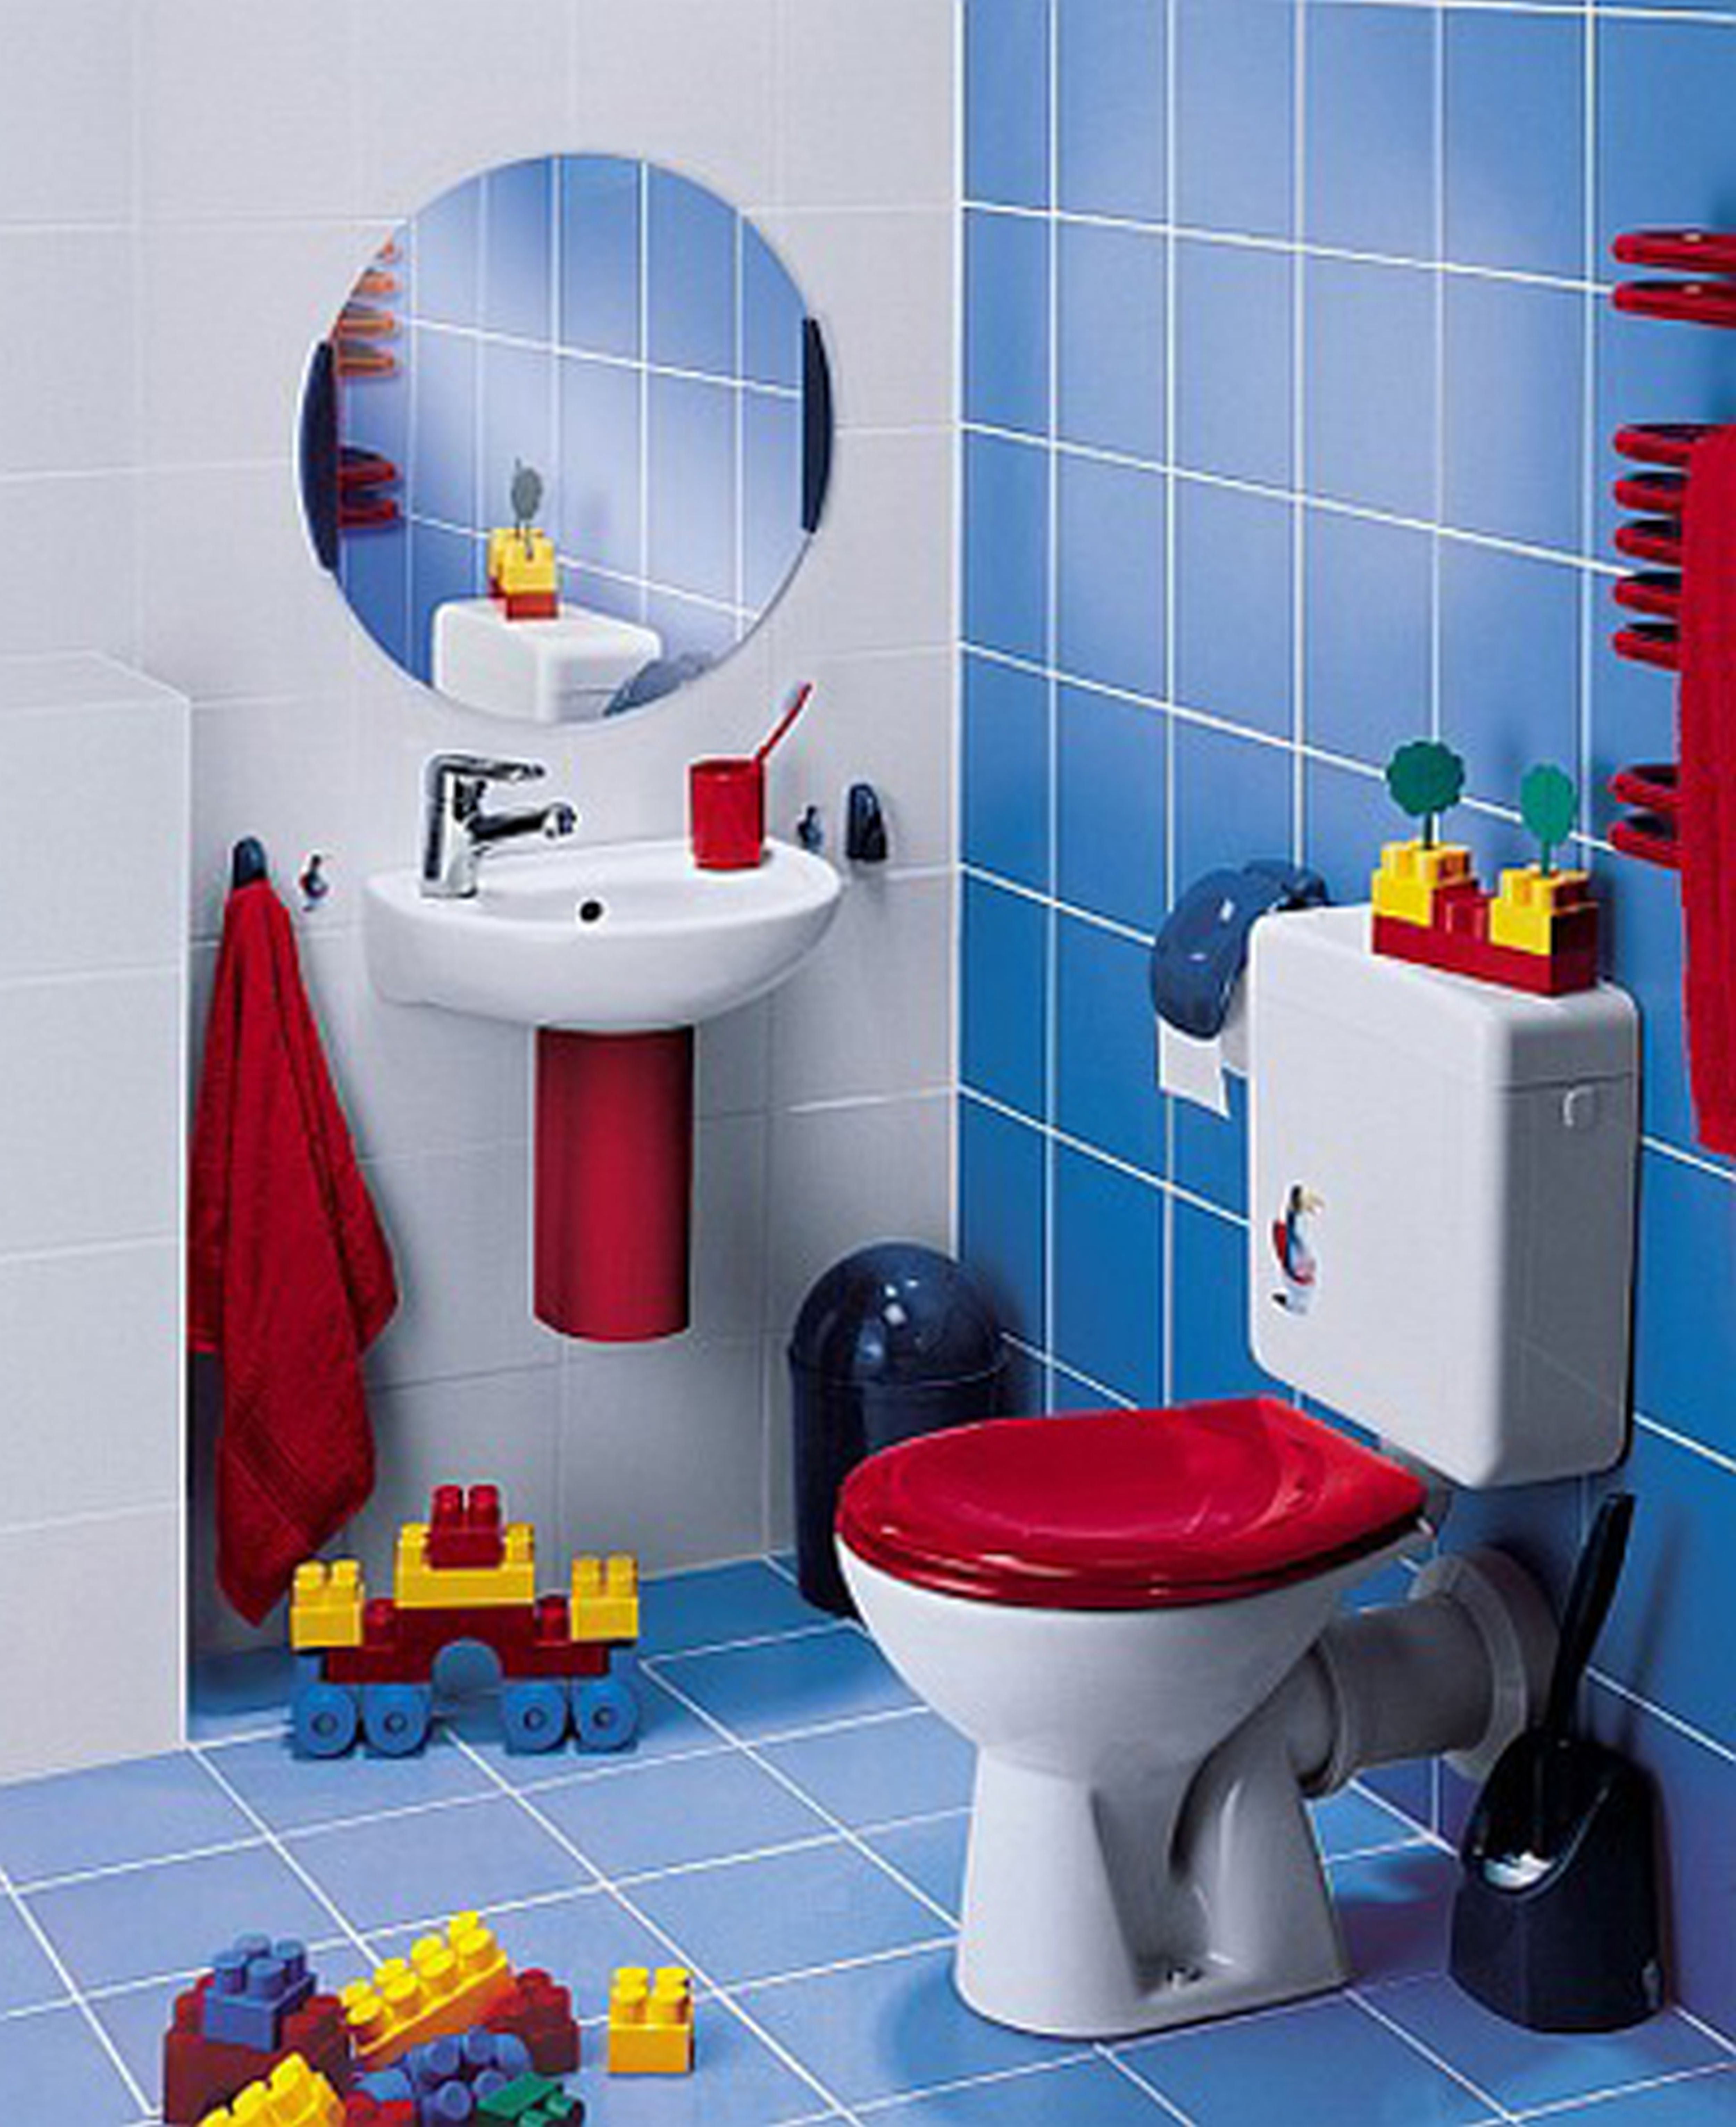 Bathroom With Wood Tile For Kids Osbdata Kids Bathrooms - Animal print bathroom decor for small bathroom ideas